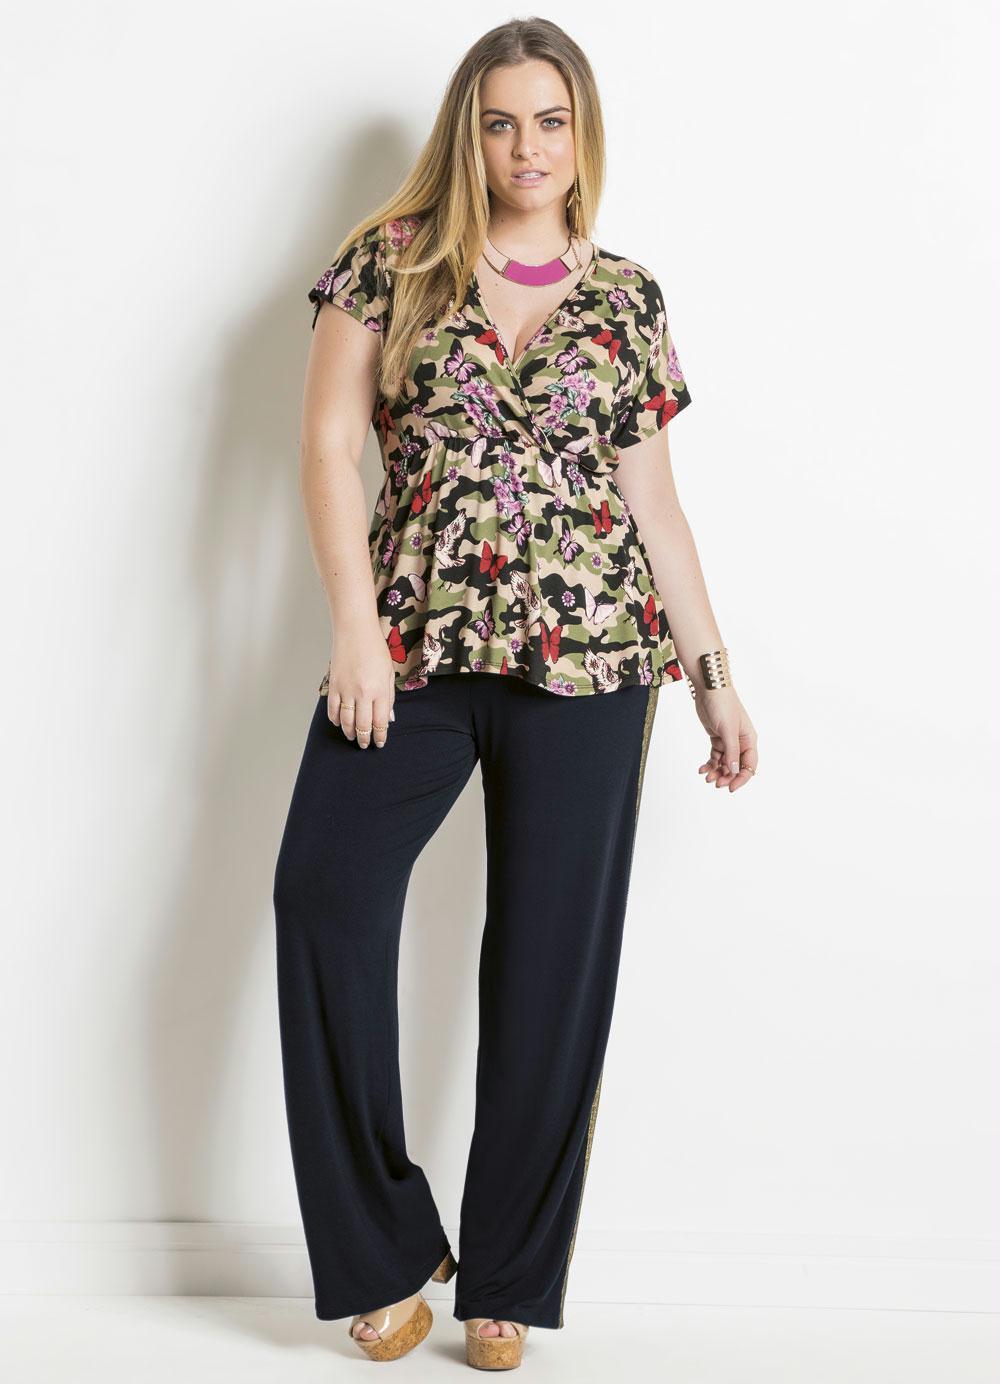 abdeff8b09 Blusa Transpassada Camuflada Plus Size Quintess - Quintess Outlet